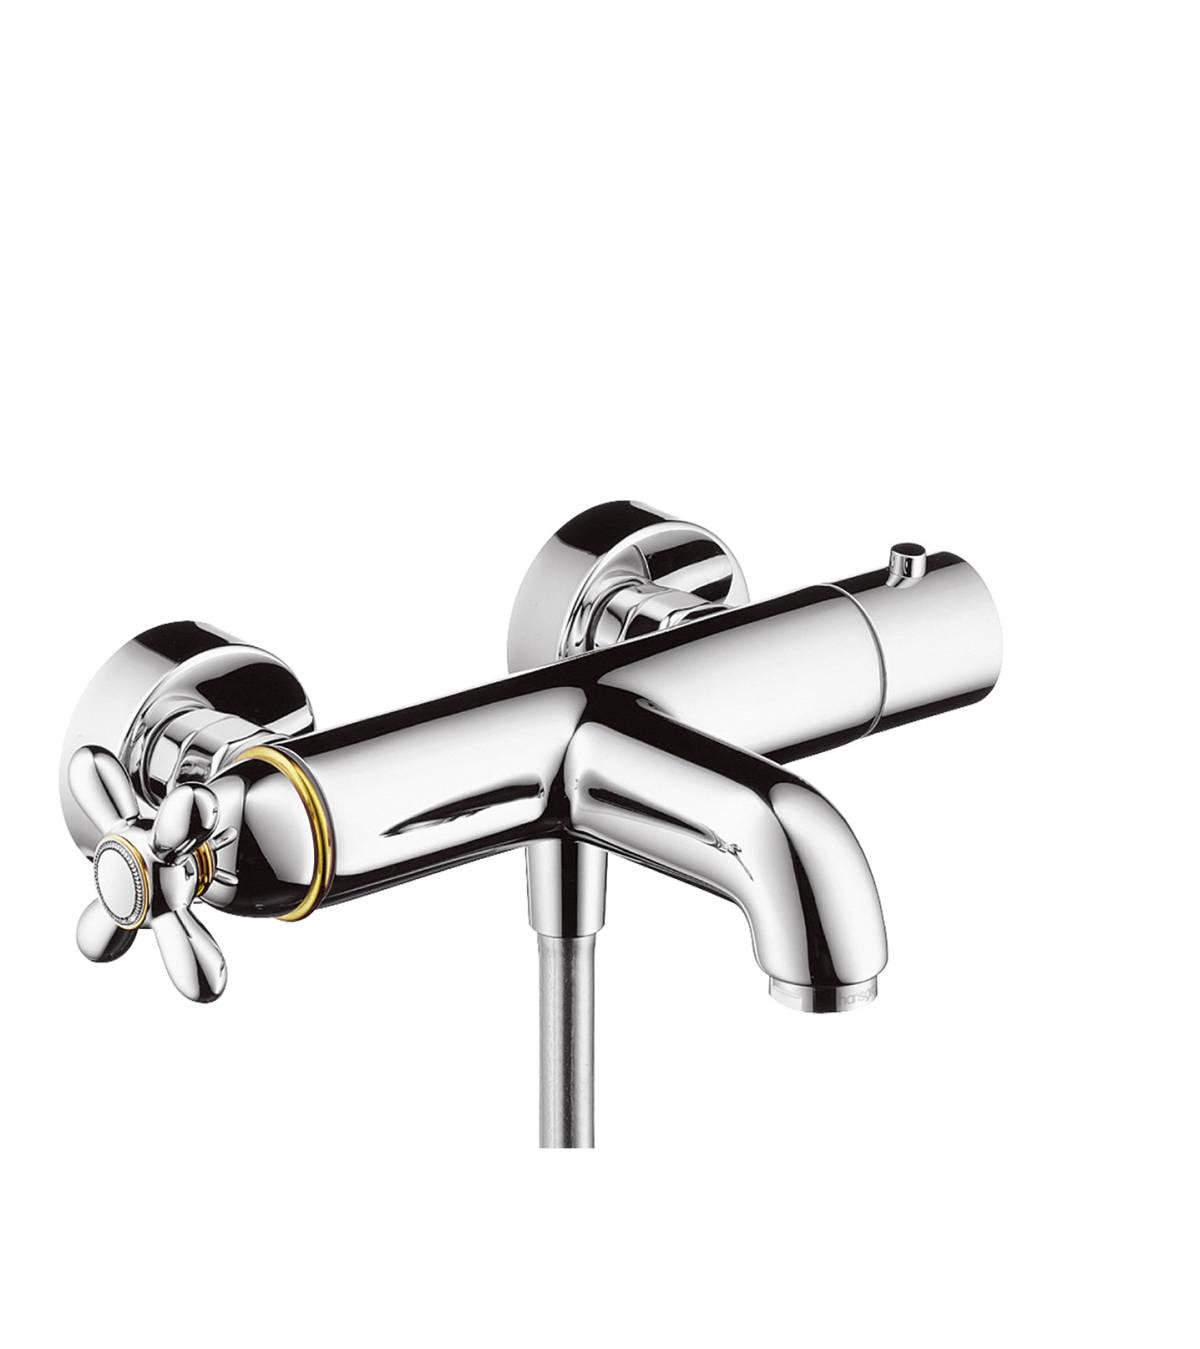 Termostato de bañera visto de cruceta, cromo/color oro, 17241090